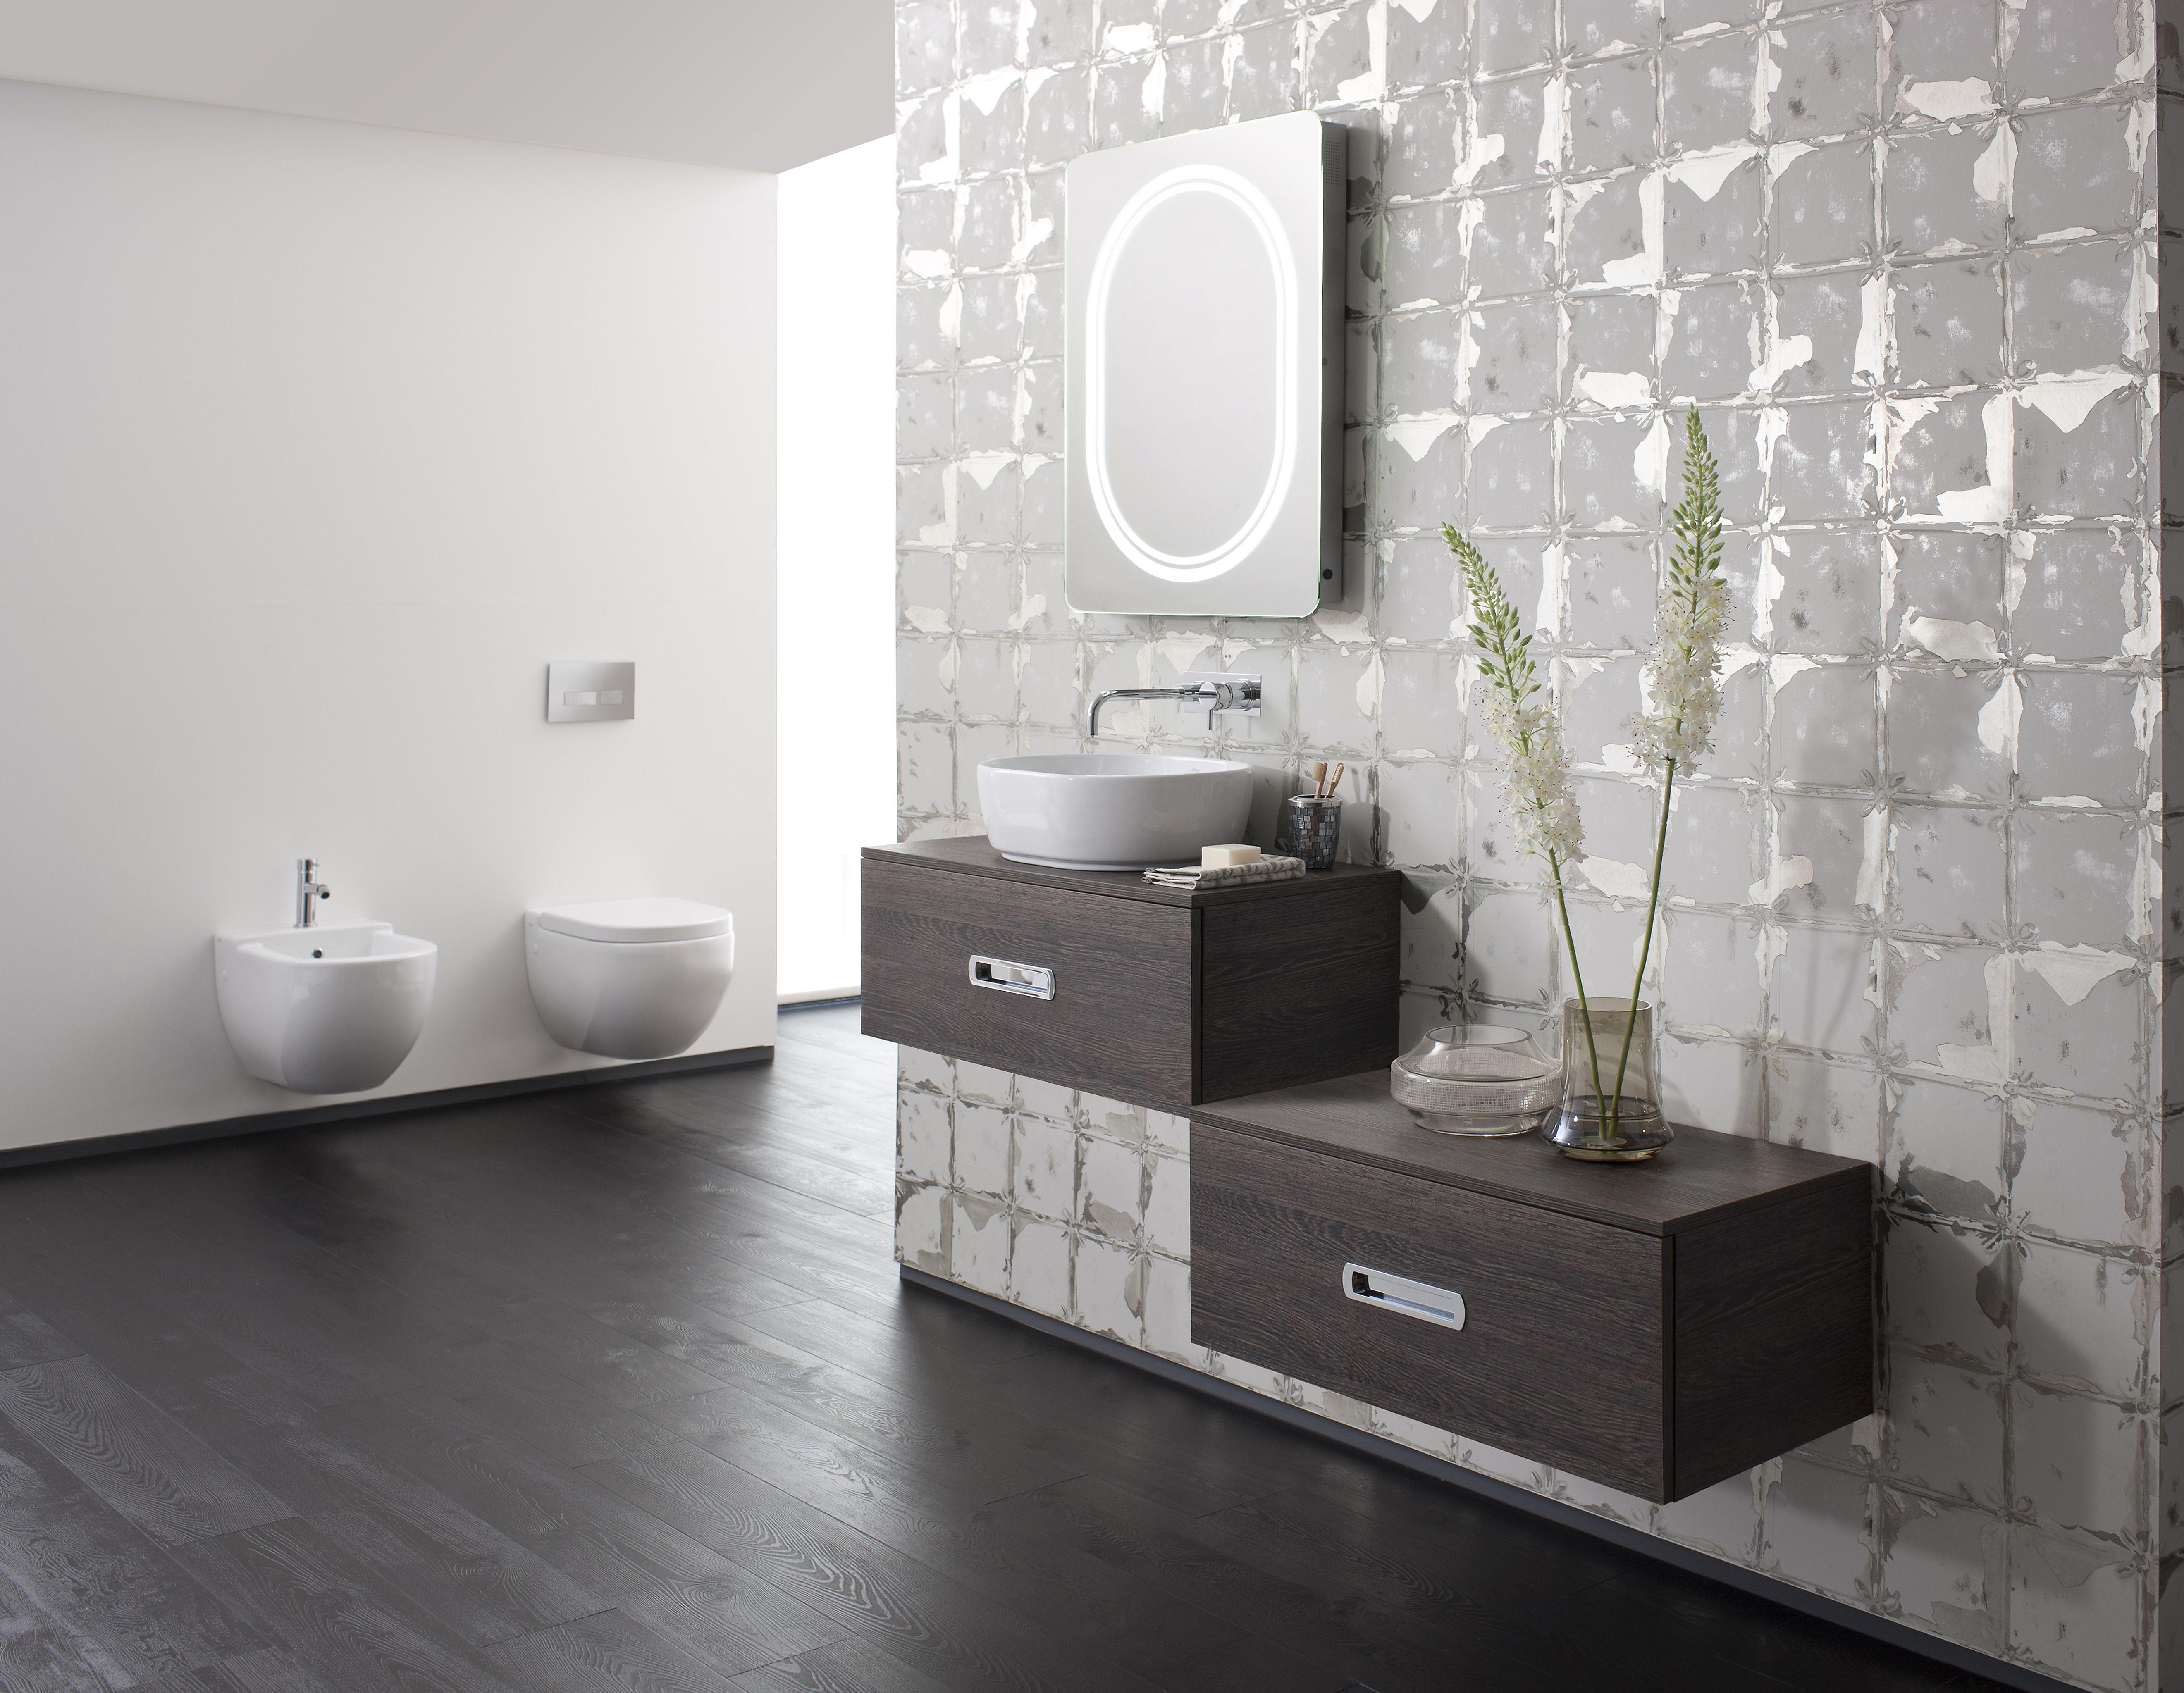 Seattle Ebony Bathroom Furniture Range From Crosswater Httpwww - Bathroom furniture seattle